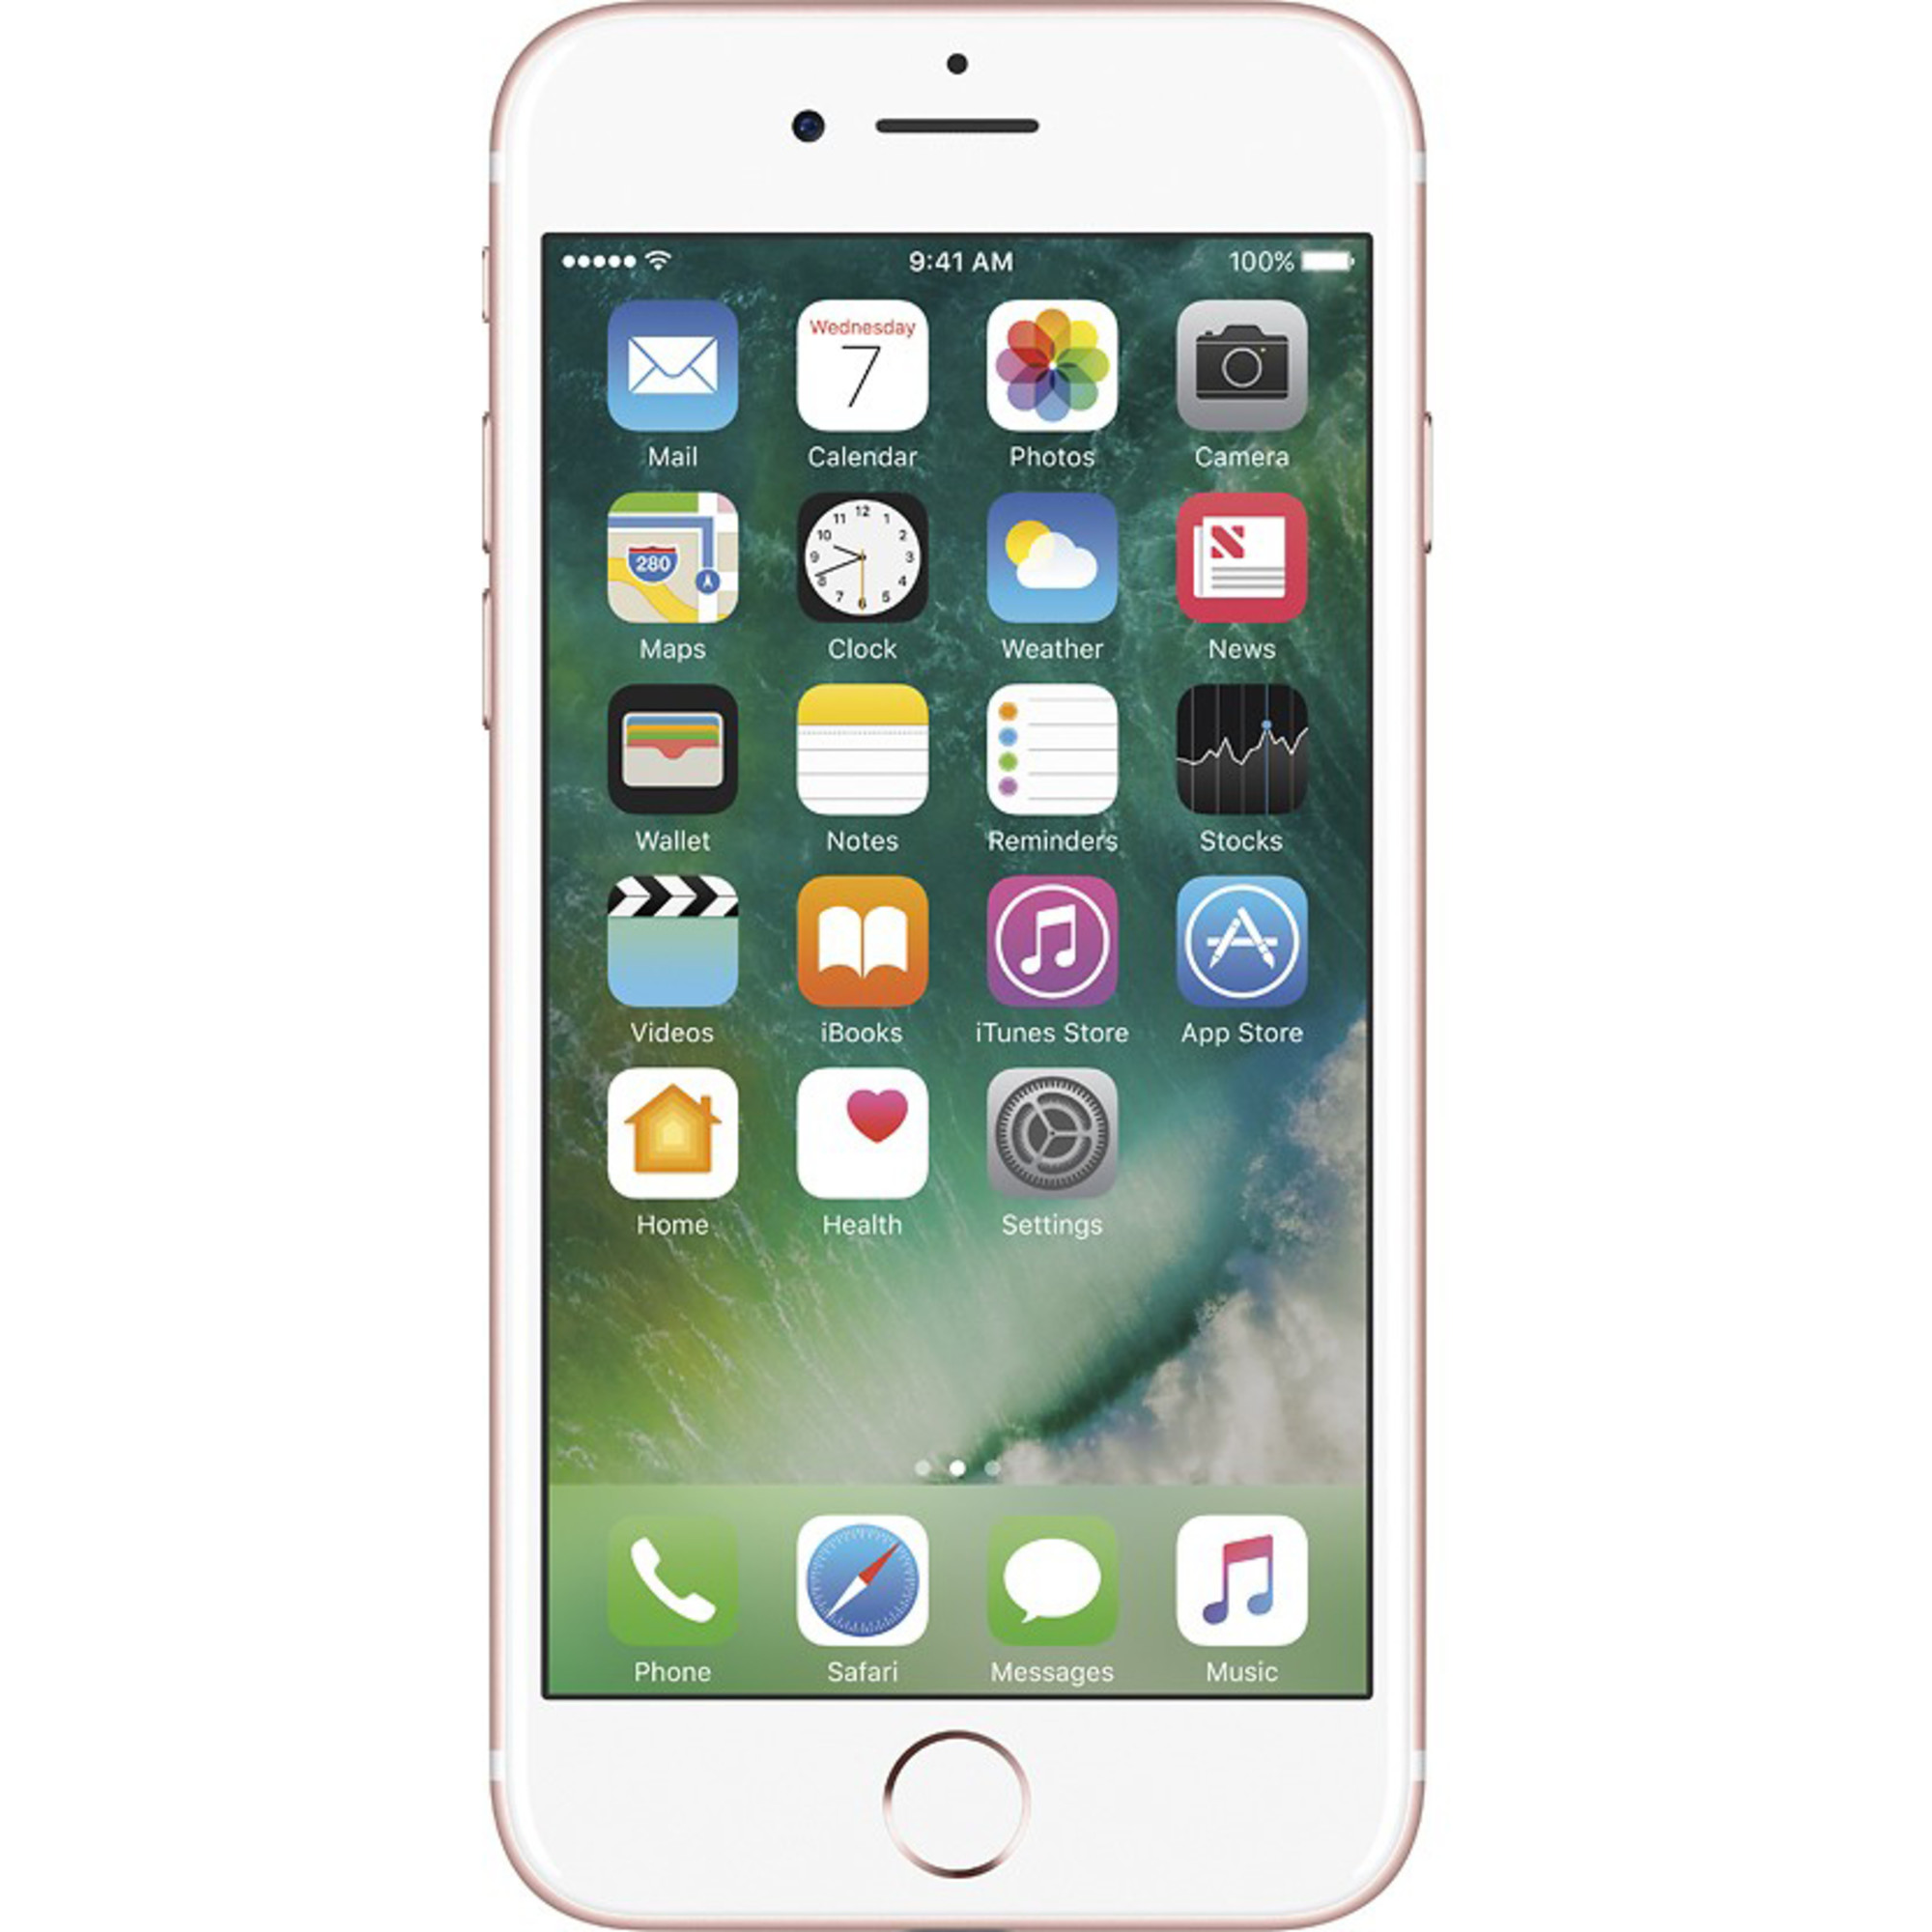 apple iphone 7 256gb unlocked gsm quad core 12mp phone. Black Bedroom Furniture Sets. Home Design Ideas